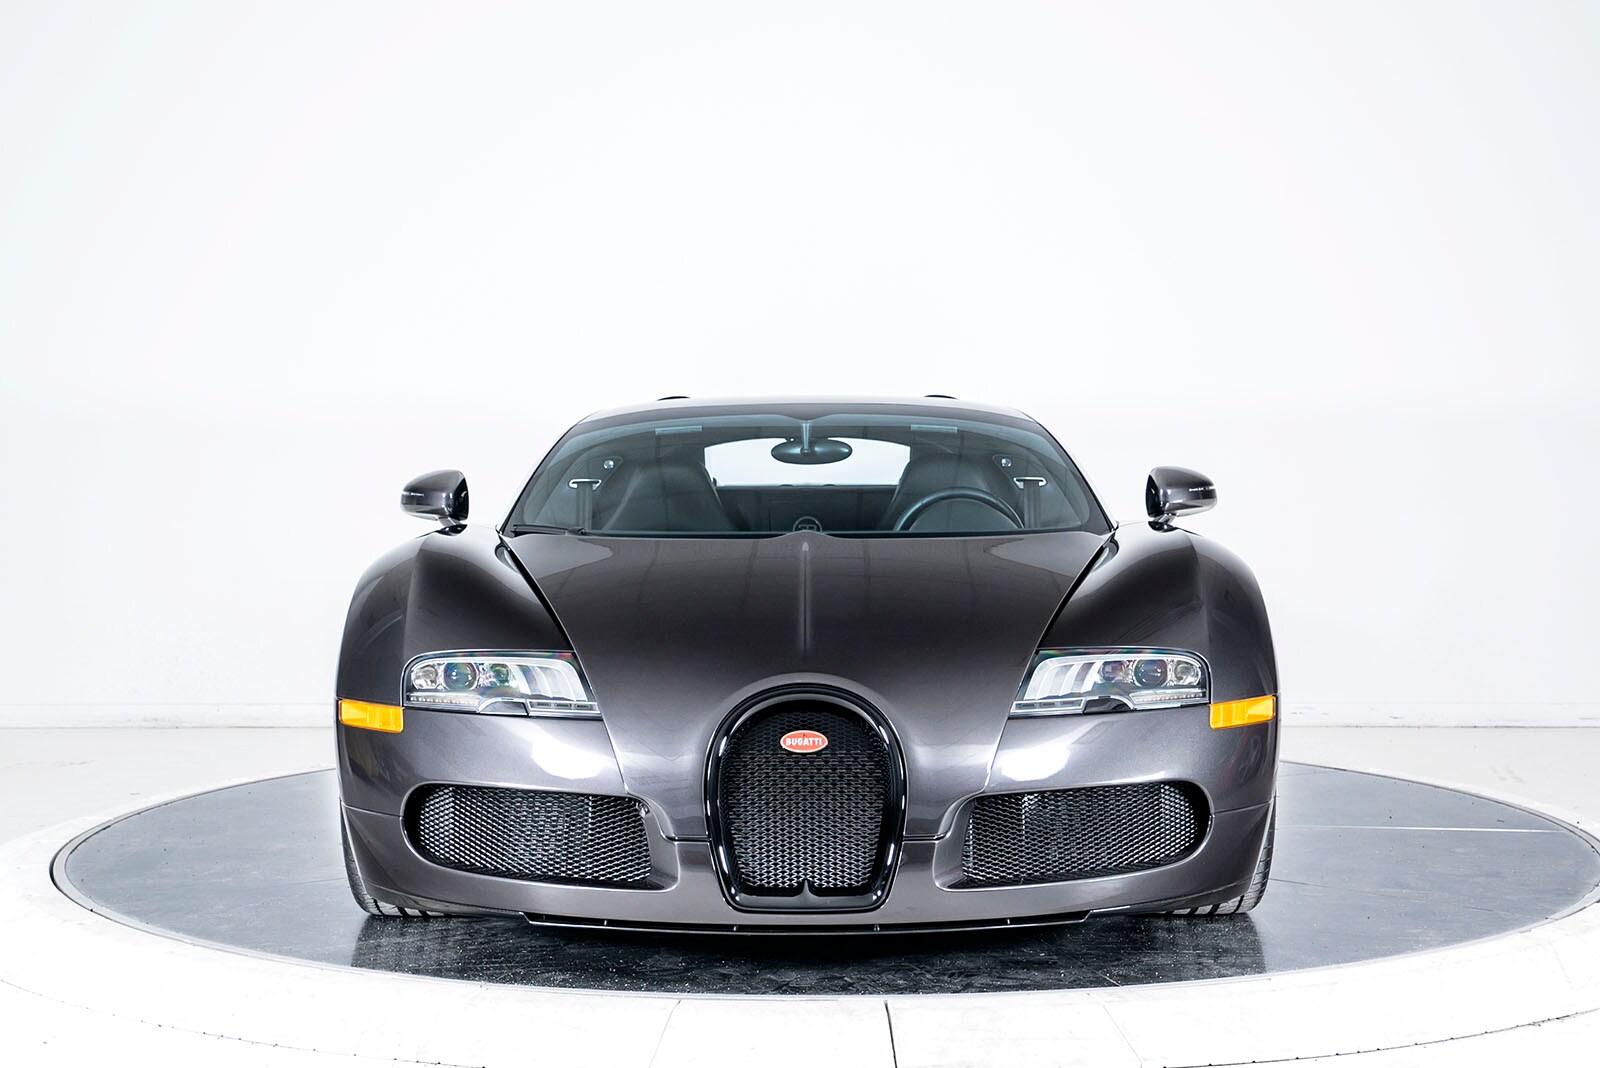 used 2012 bugatti veyron 16 4 grand sport for sale. Black Bedroom Furniture Sets. Home Design Ideas